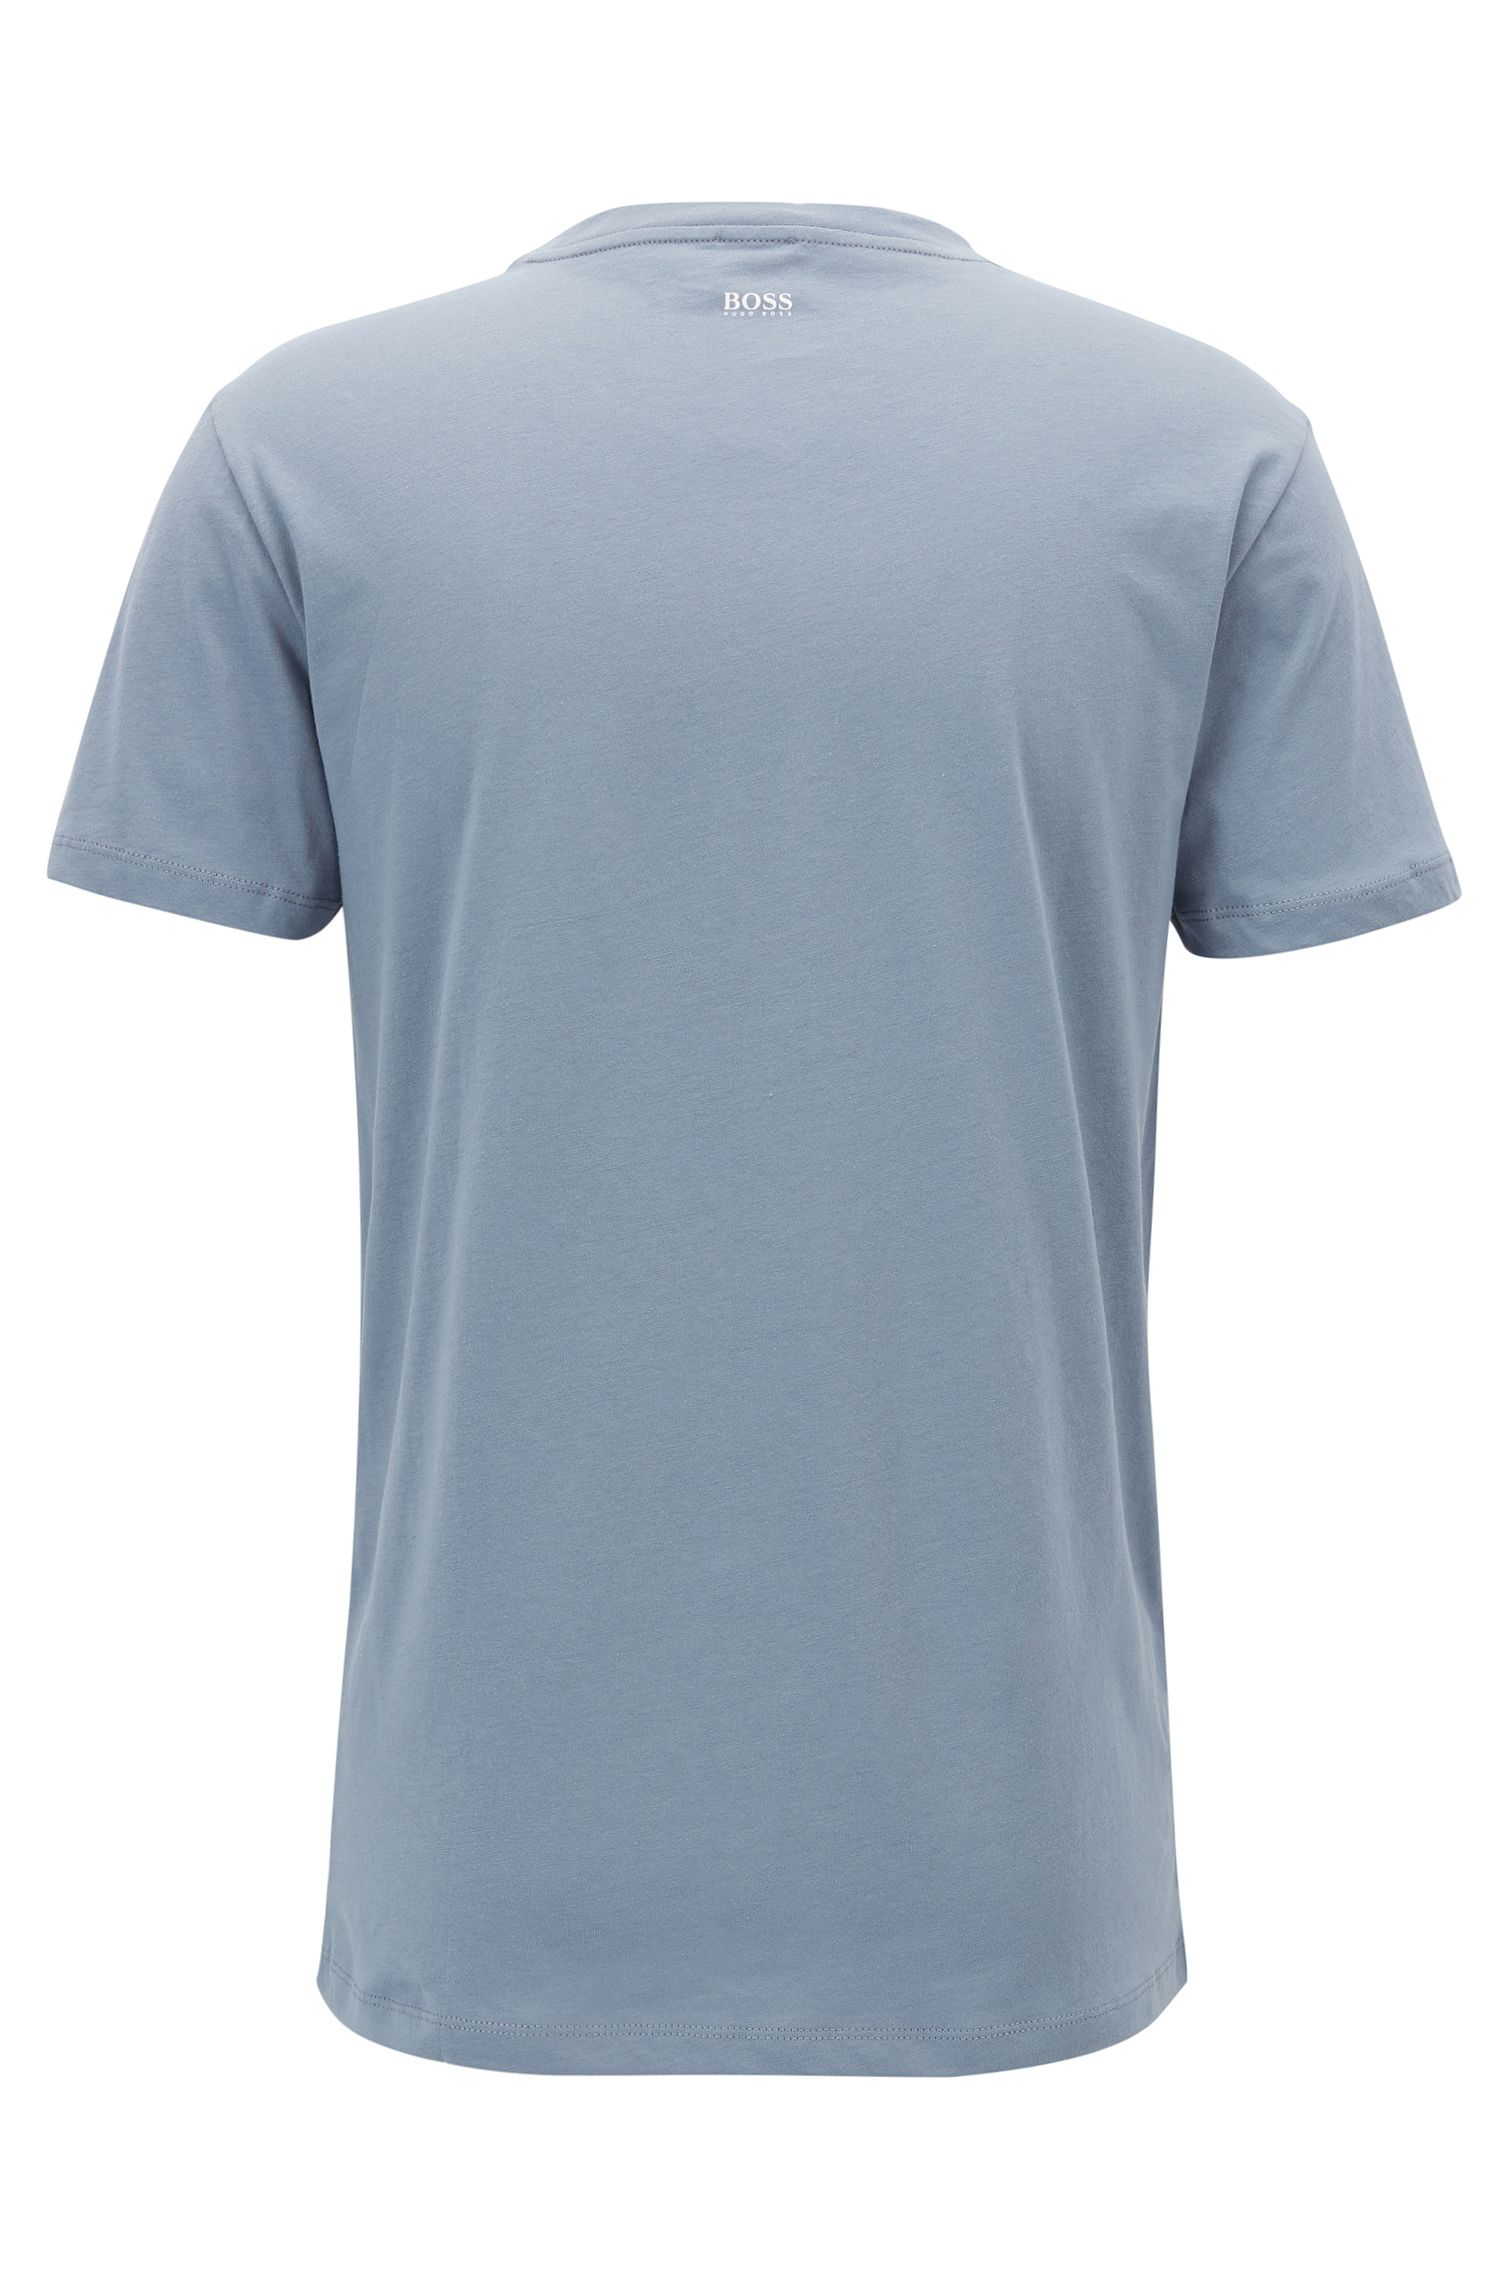 Cotton Jersey Graphic T-Shirt | Tauno